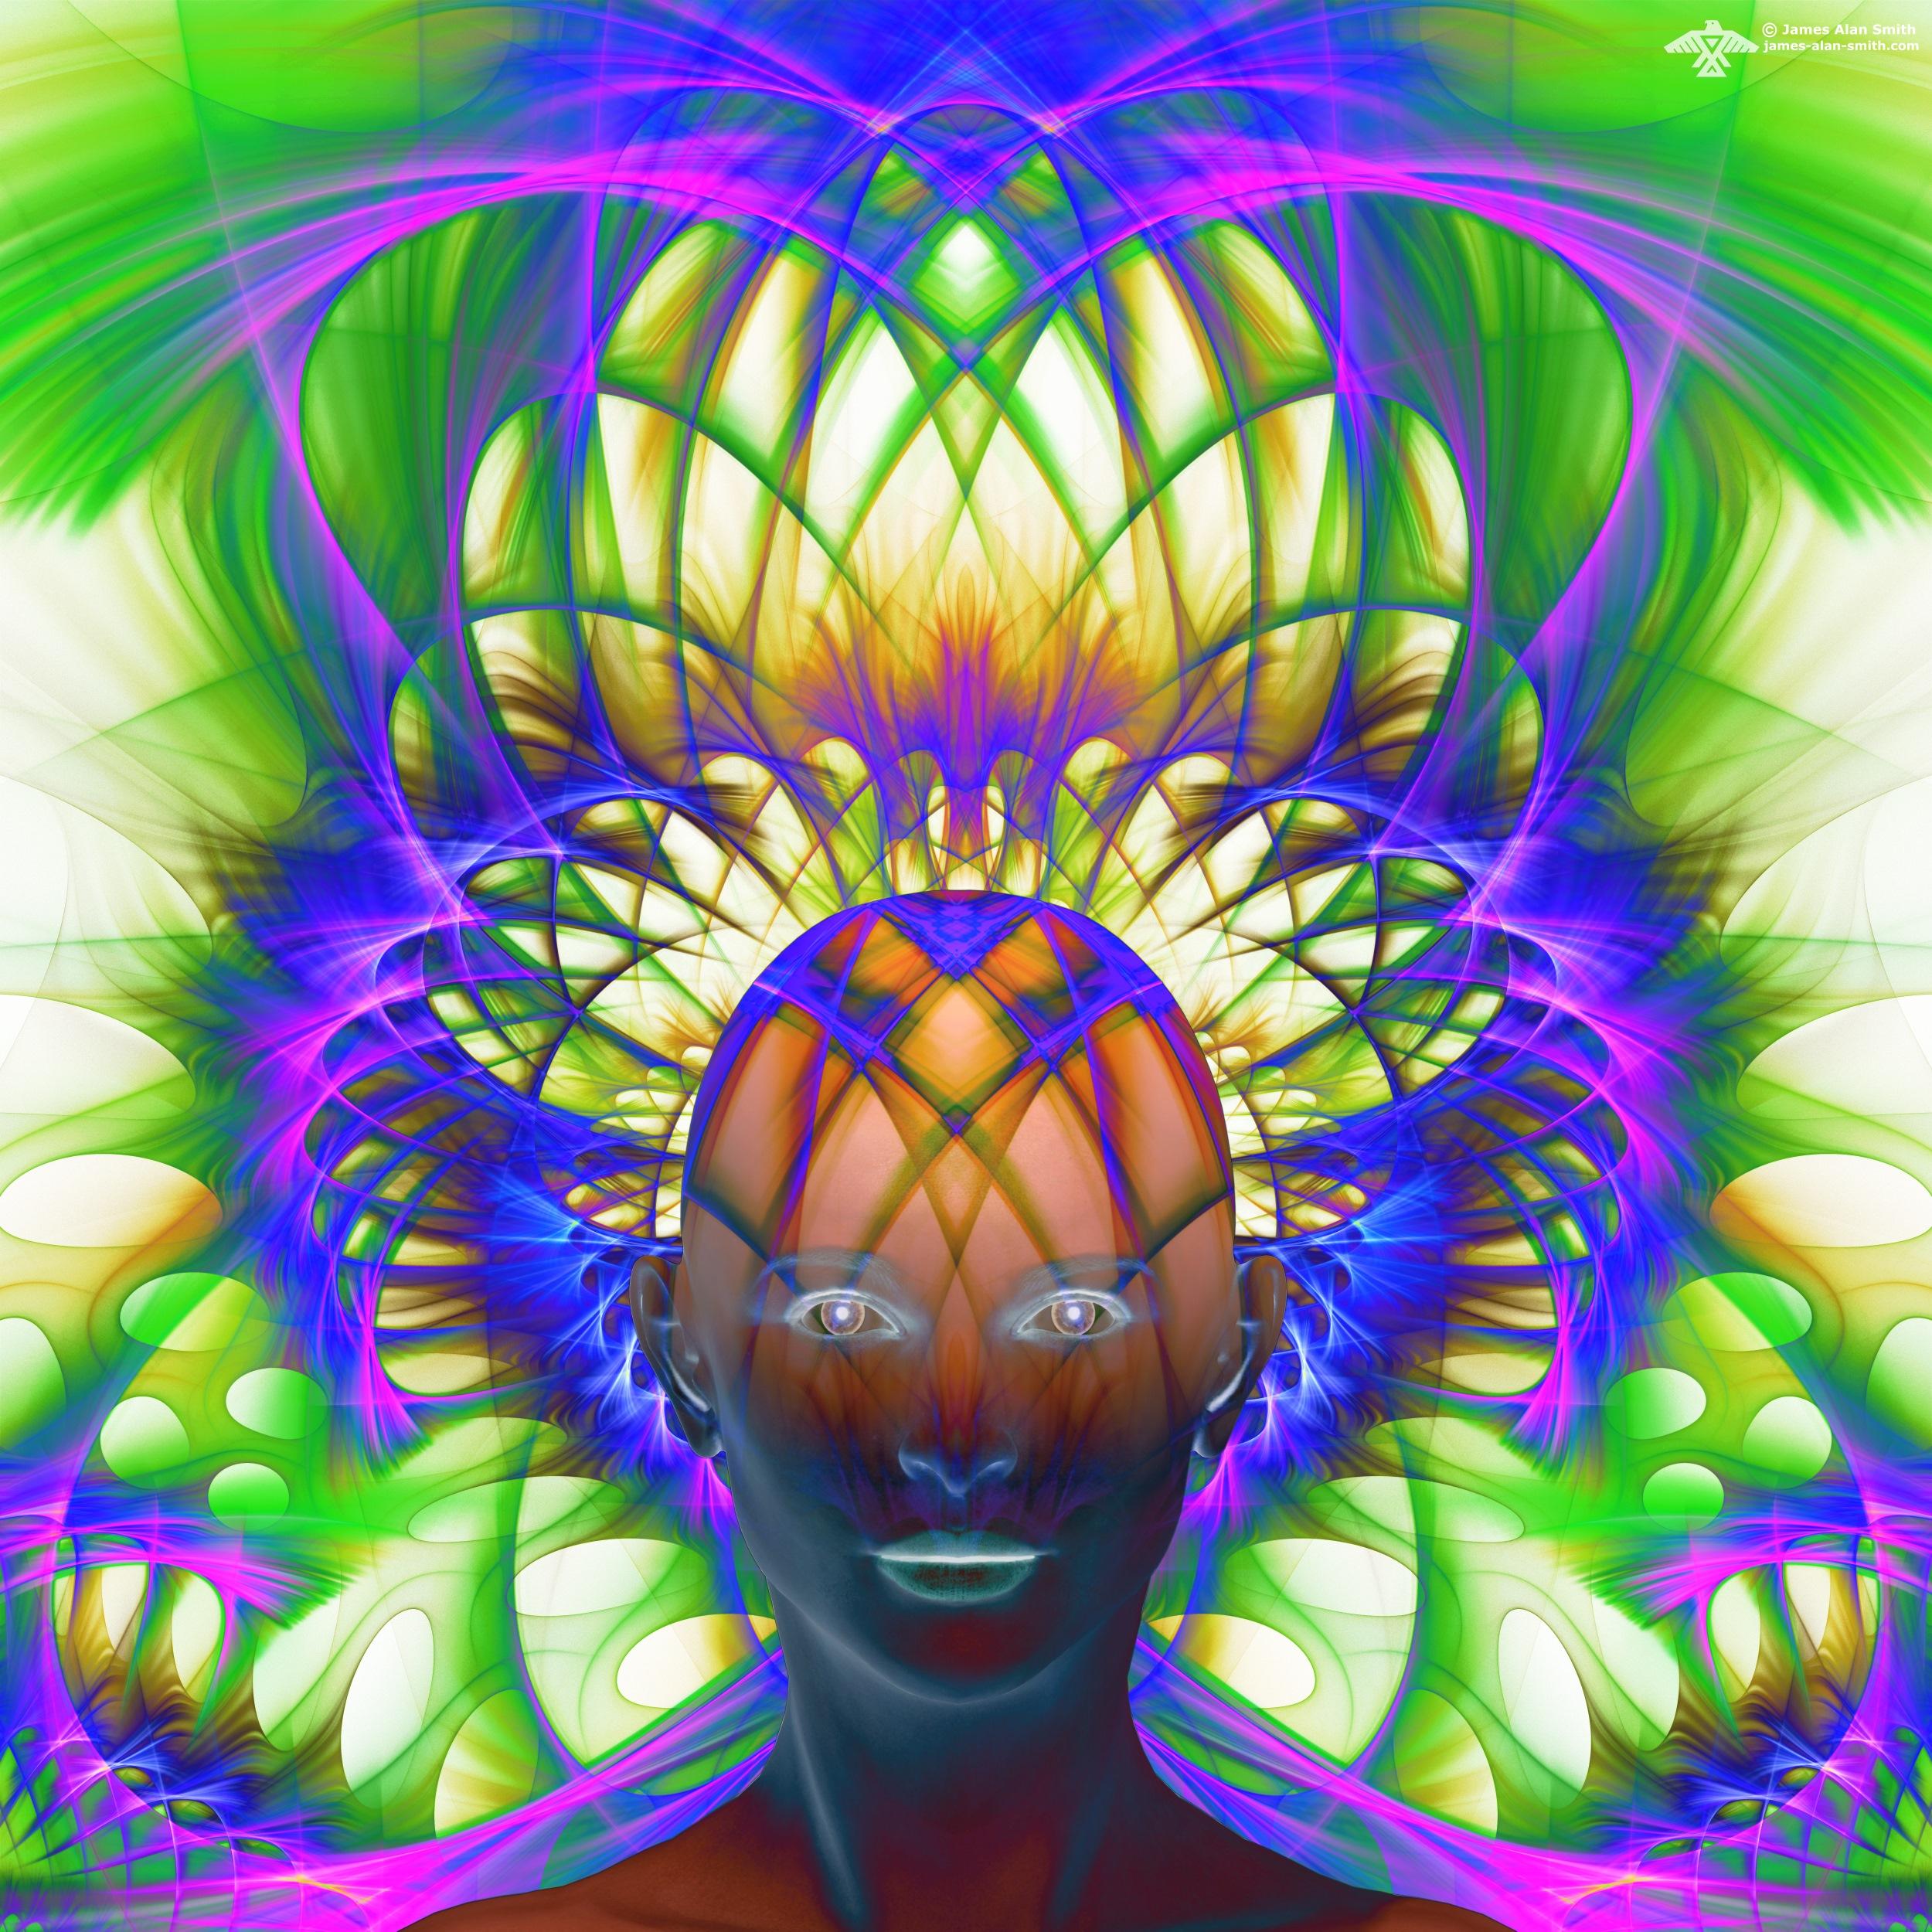 Fullsize Of Luminous Beings Are We